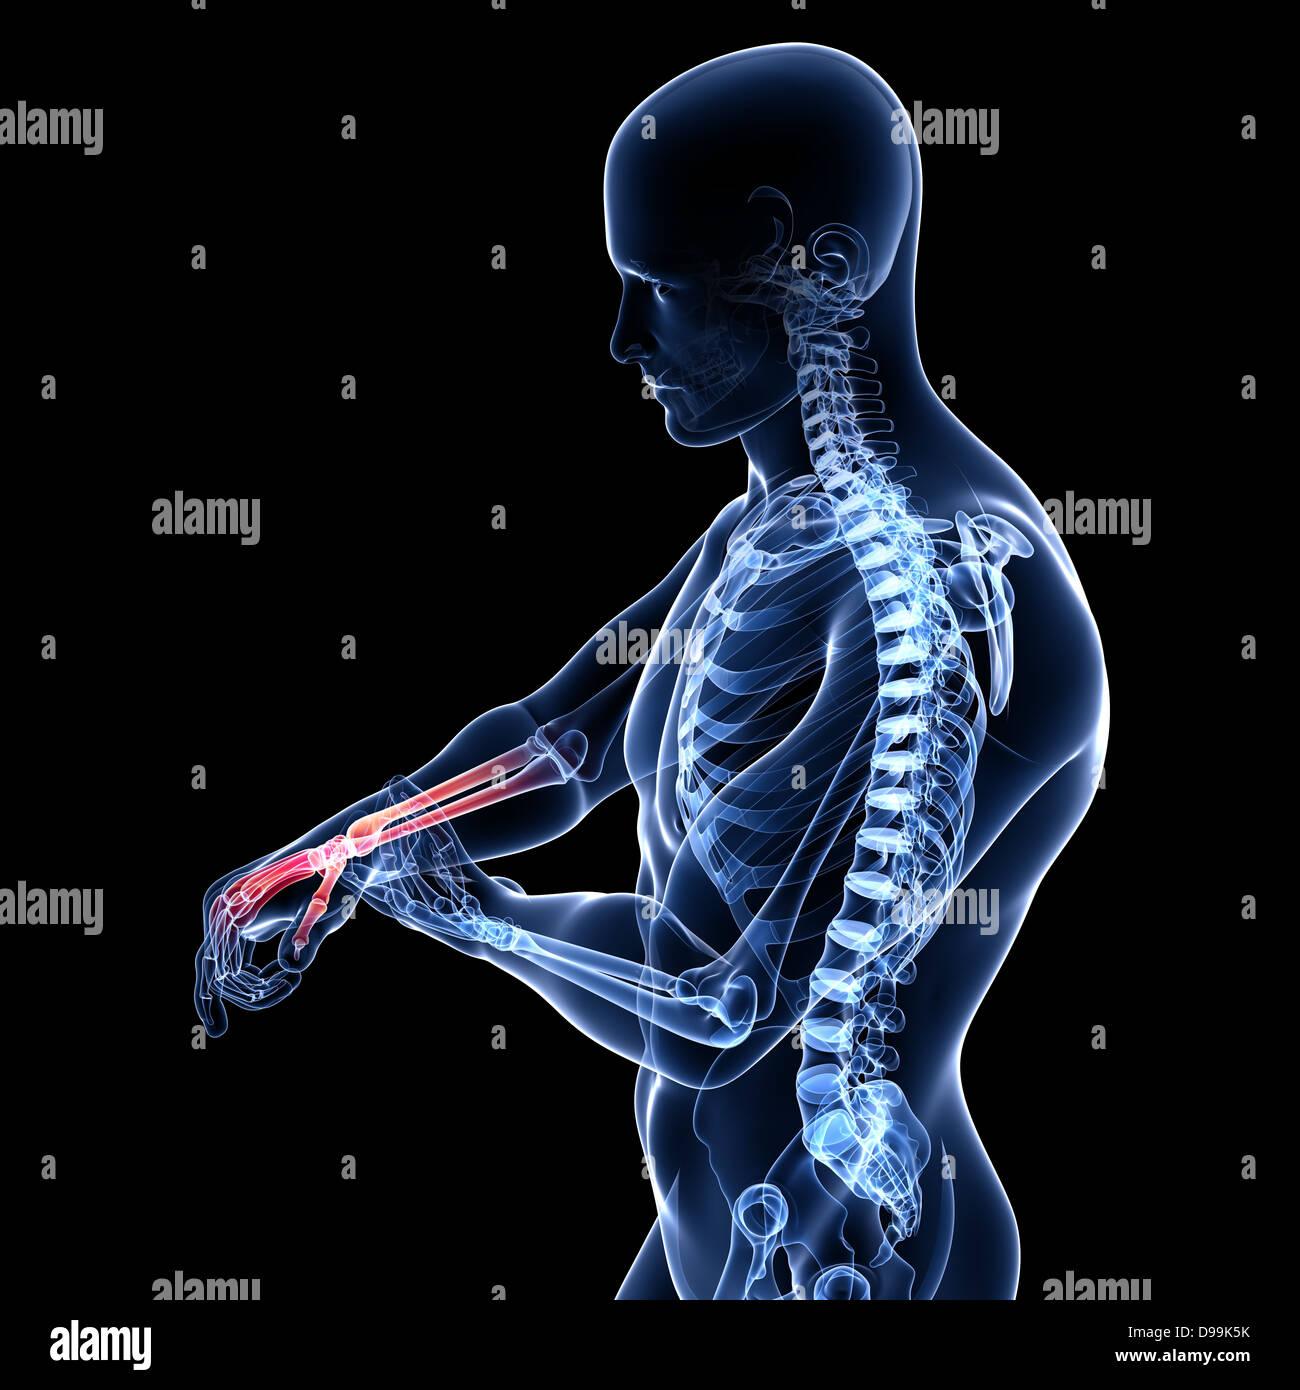 anatomy of male hand x-ray Stock Photo: 57375631 - Alamy